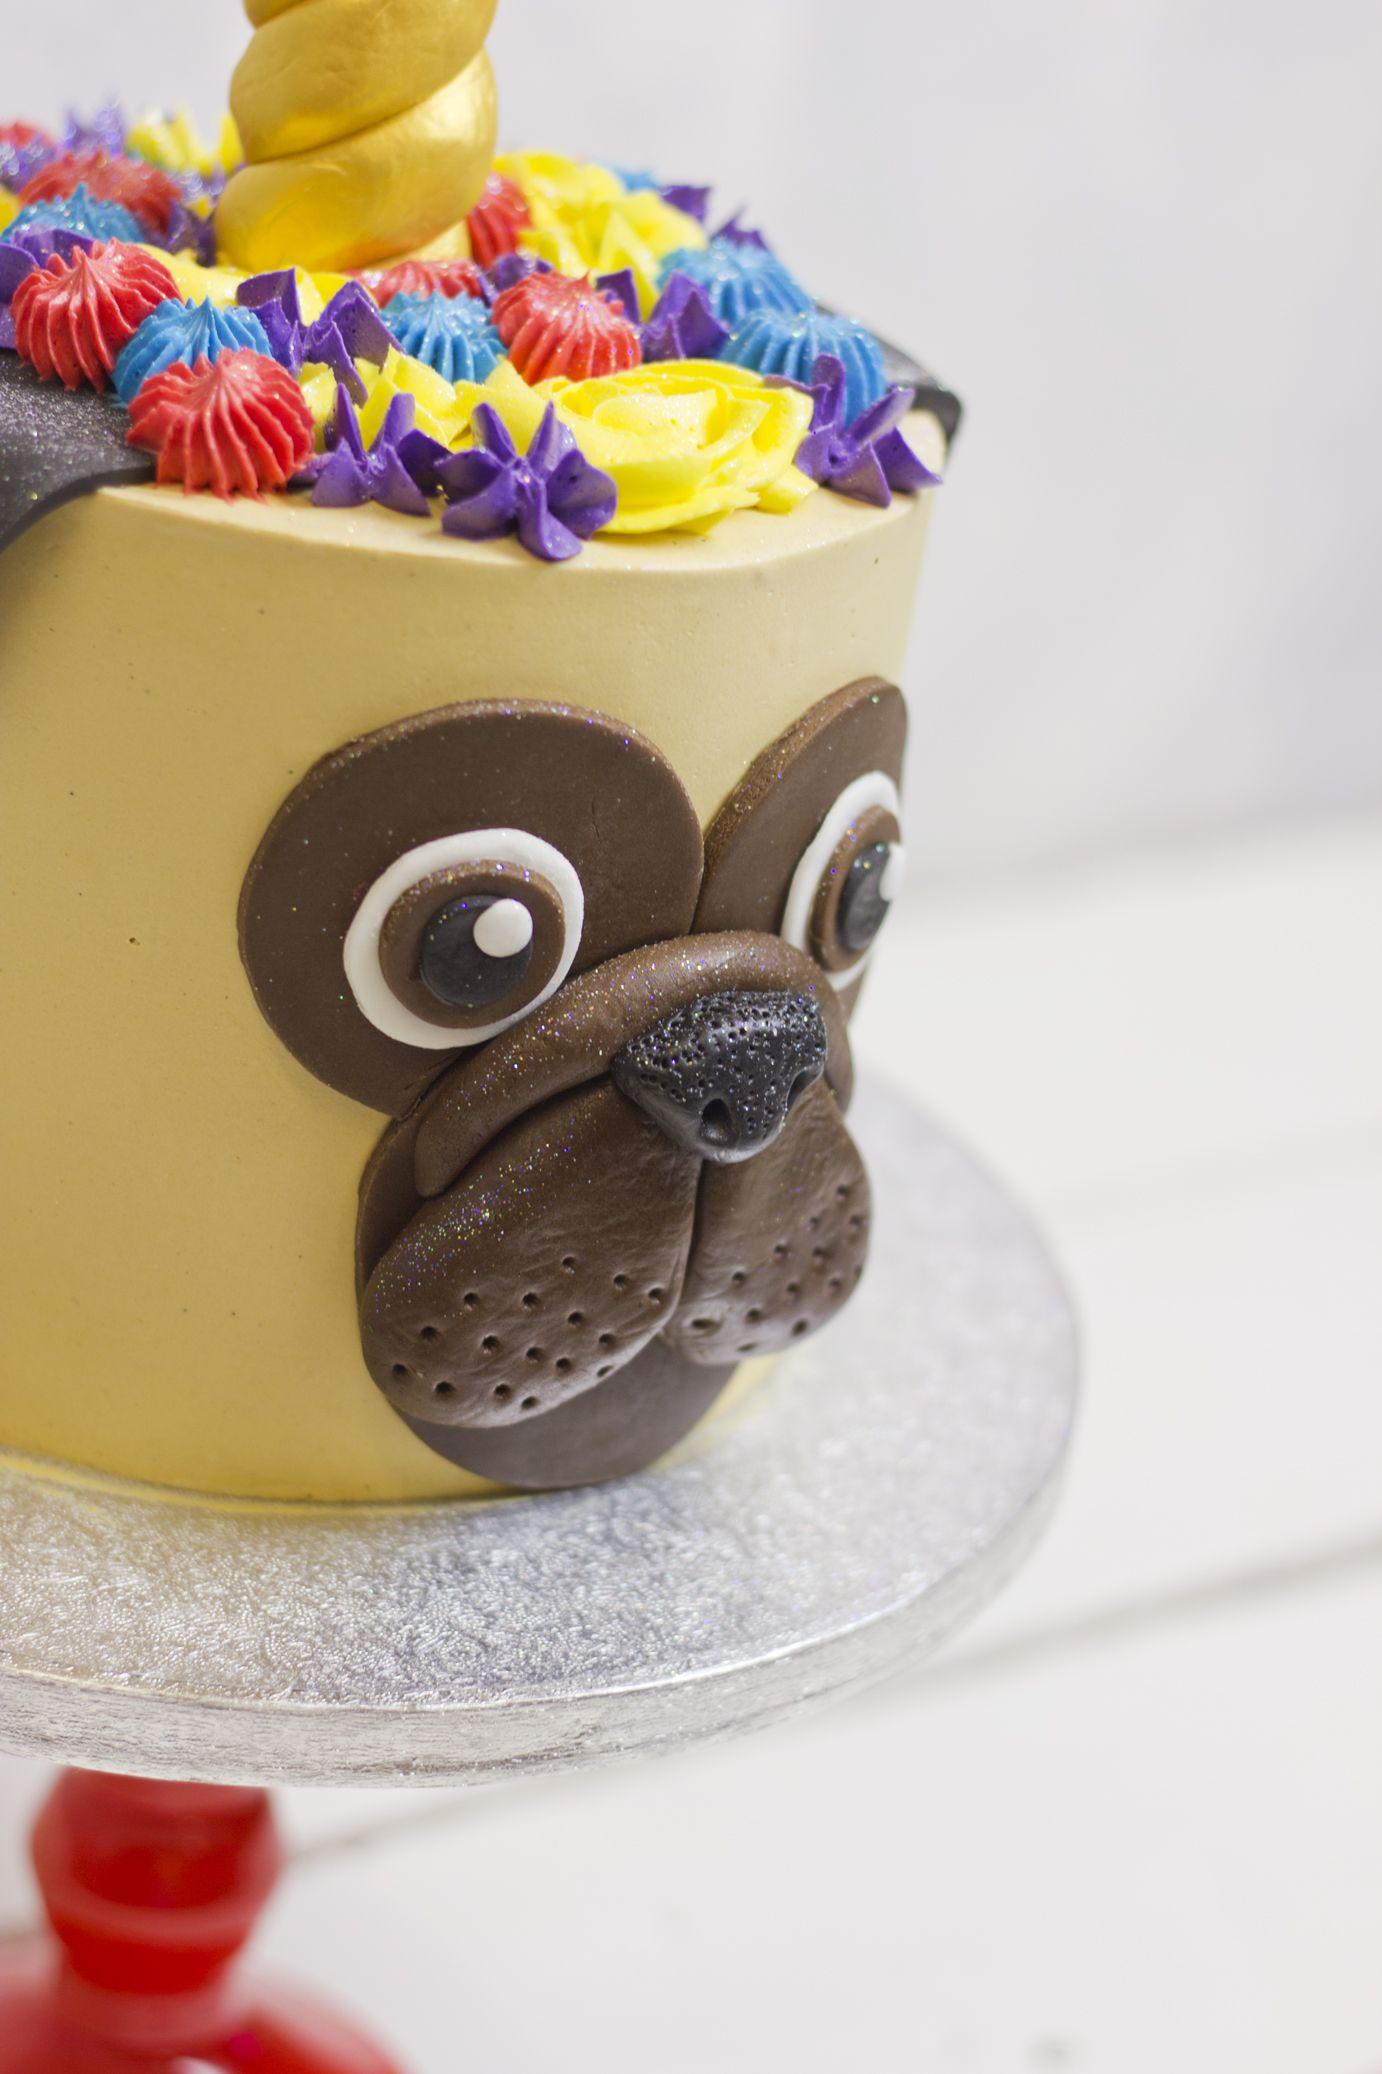 Bespoke Pug Unicorn Birthday Cake Delivered In London